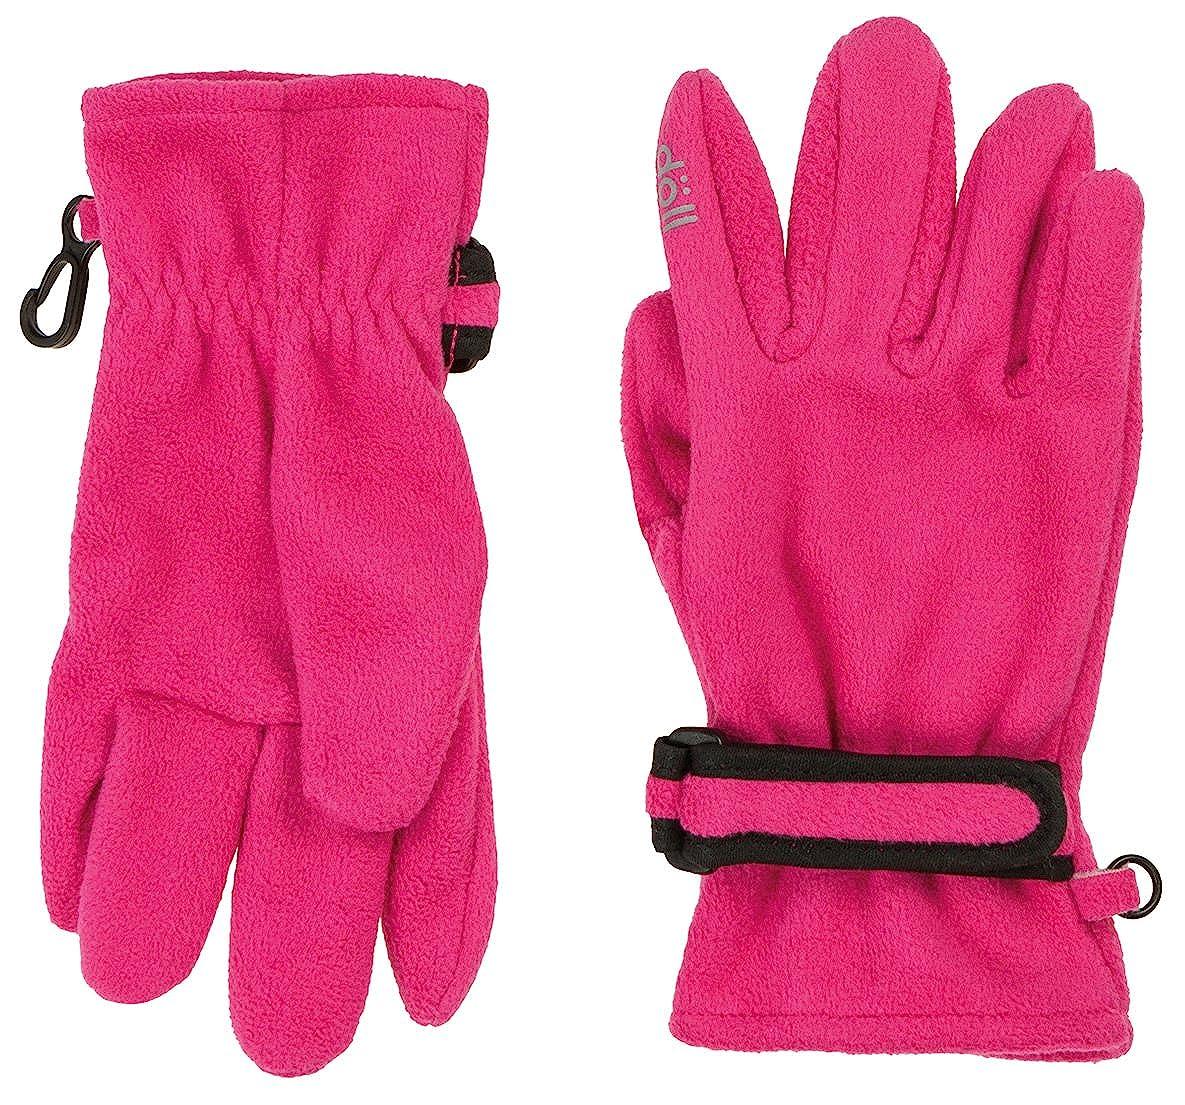 Wasserdicht,Atmungsaktiv /& Winddicht von D/ÖLL in Pink Fingerhandschuhe aus Fleece